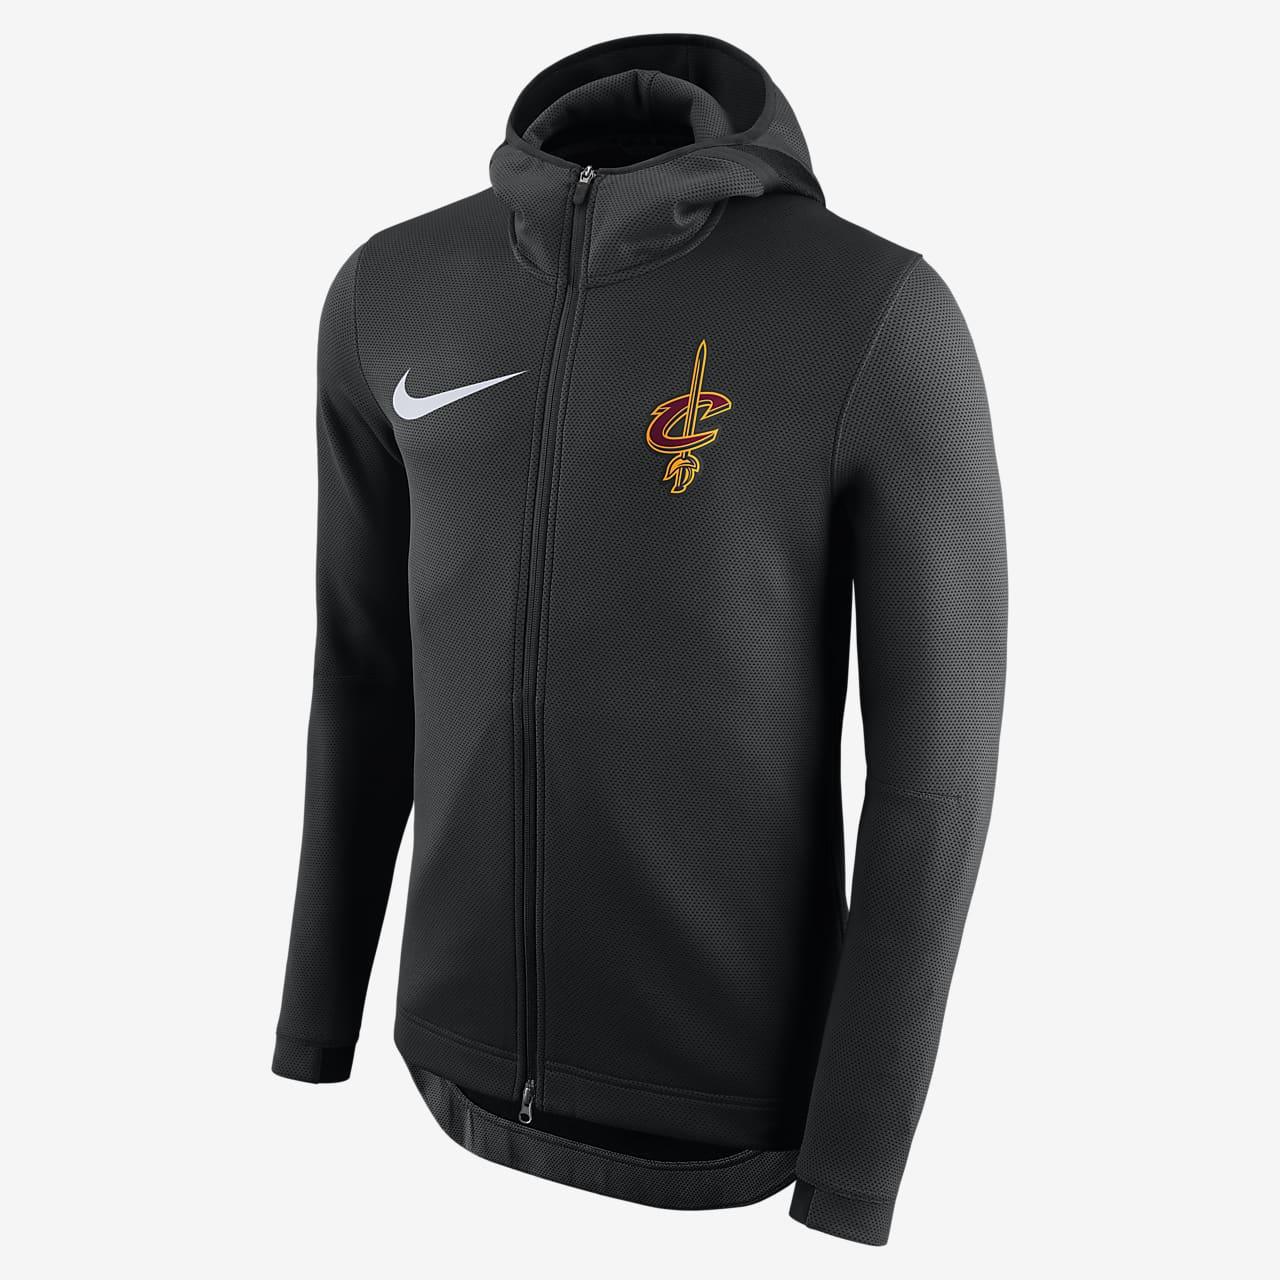 Andrew Halliday propiedad vacío  Cleveland Cavaliers Nike Therma Flex Showtime Men's NBA Hoodie. Nike.com